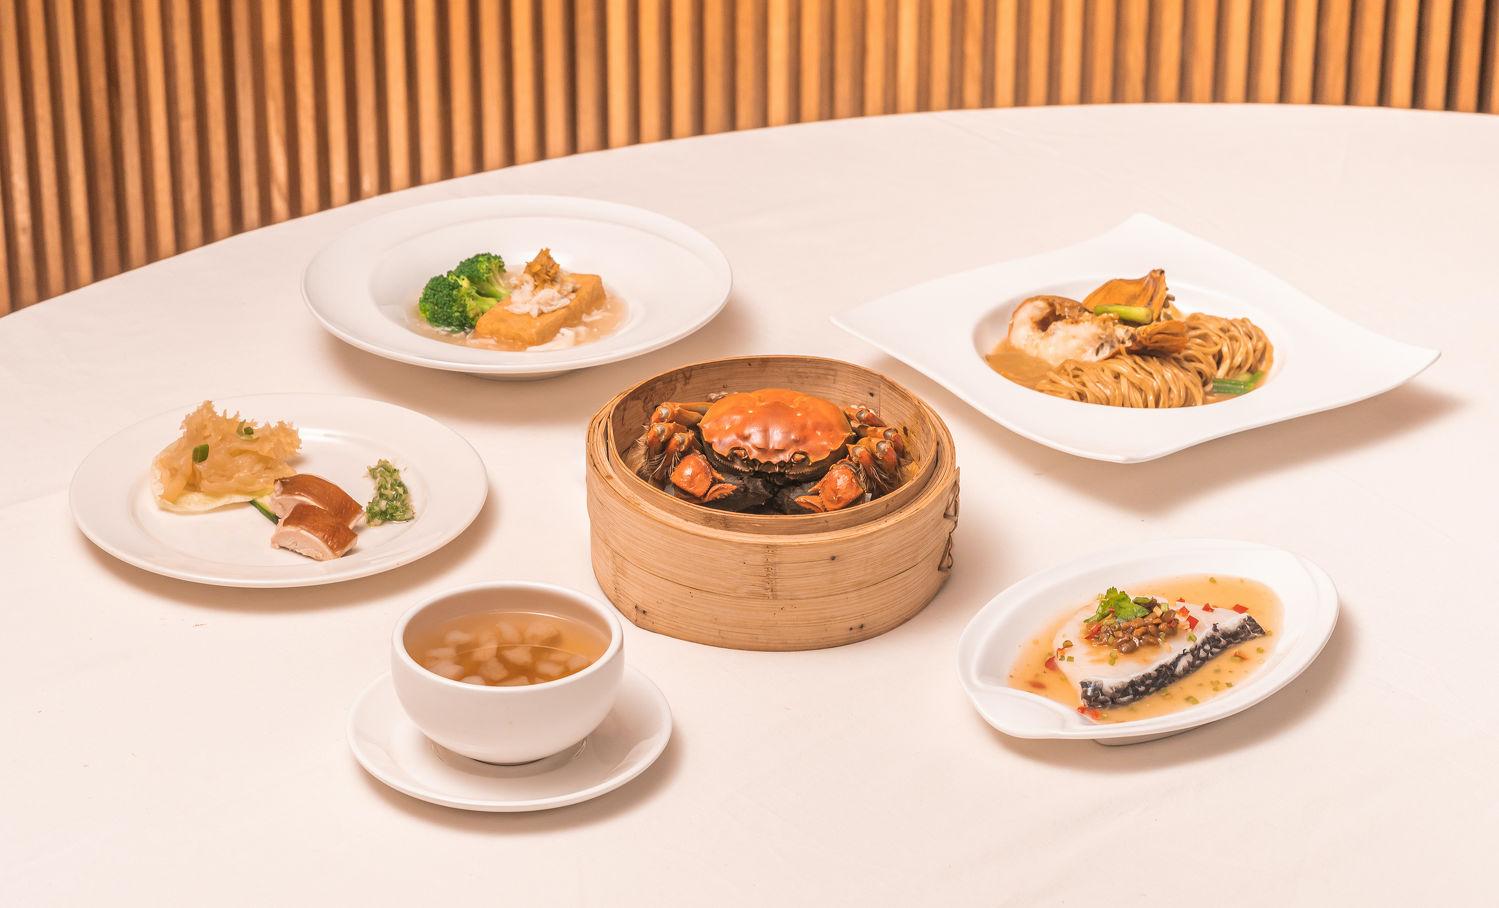 FOOD - THE EDGE SINGAPORE